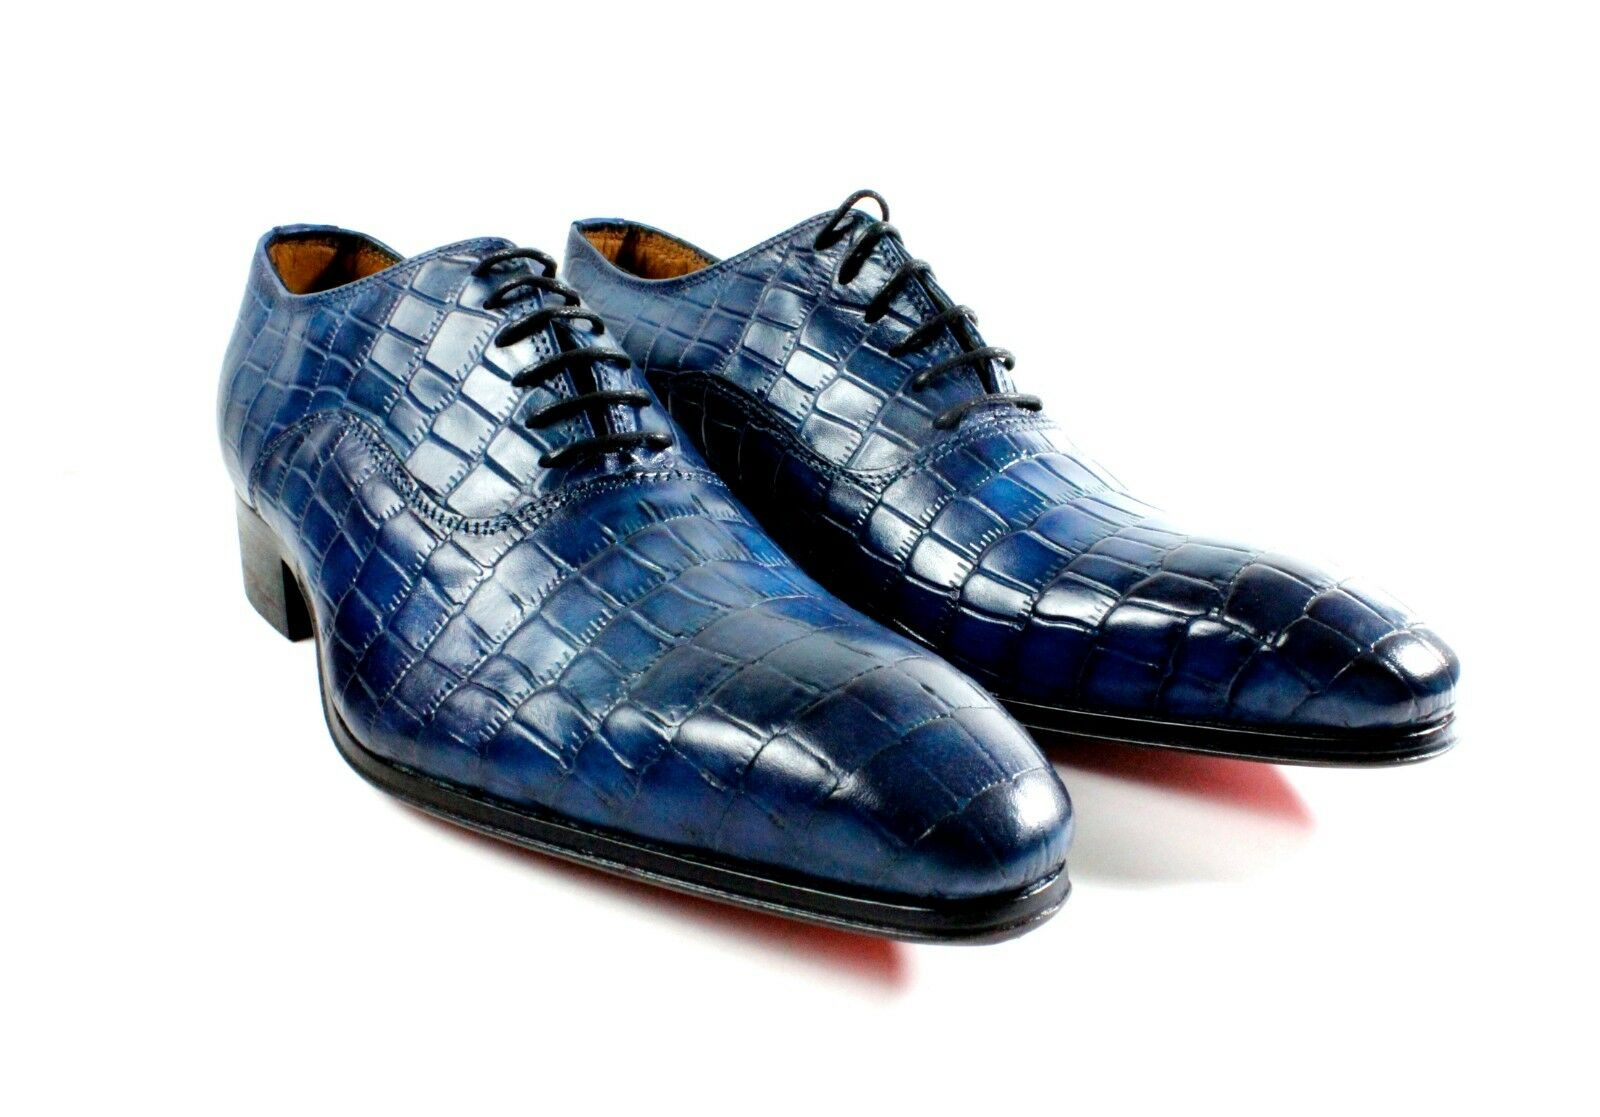 IVAN TROY Pelle Blue Crocodile  Handmade Uomo Italian Pelle TROY Dress Shoes/Oxford Shoes 21f4b4